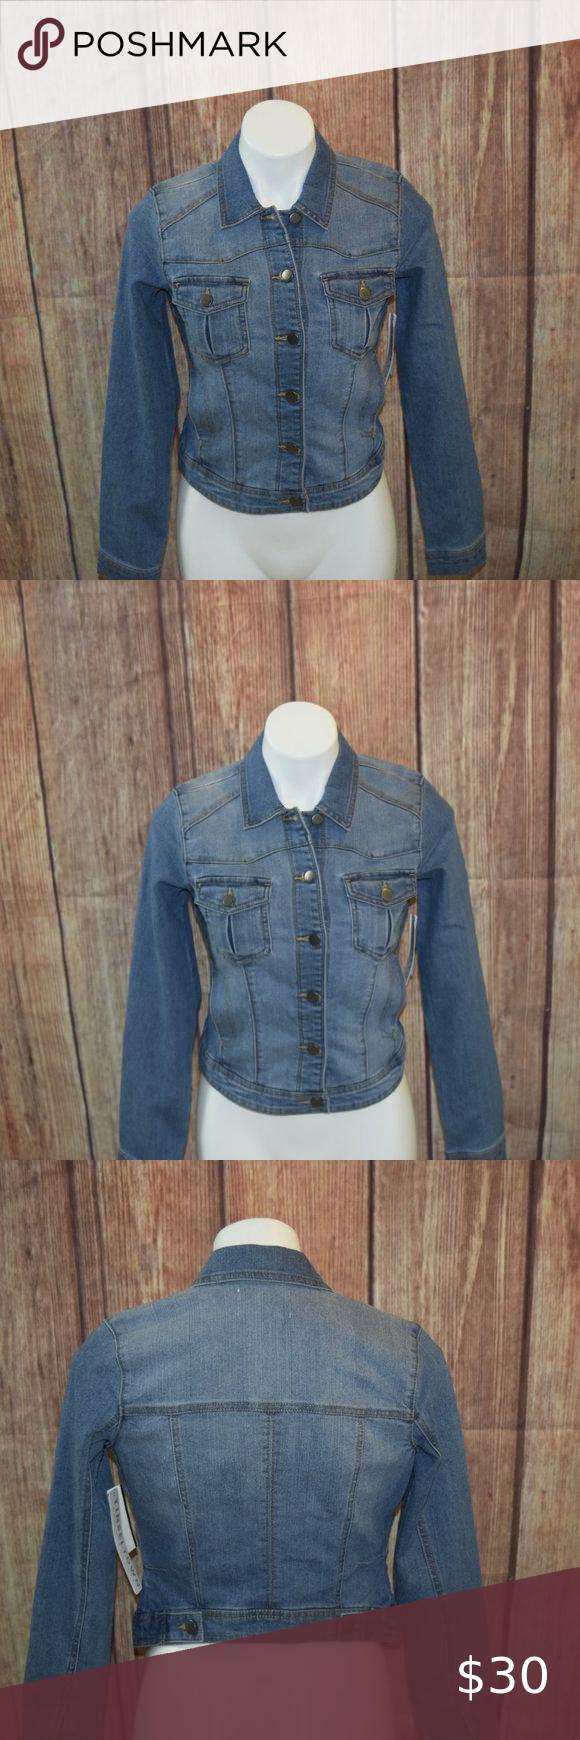 Tinsel Town Denim Jean Jacket Women S Jean Jacket Women Jackets For Women Jean Jacket [ 1740 x 580 Pixel ]